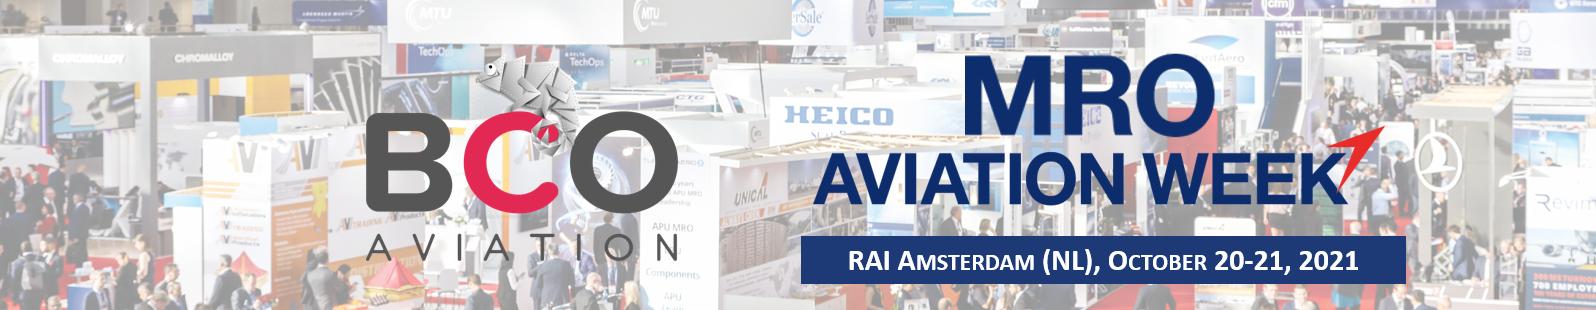 Illustration for: Meet BCO Aviation Team at MRO Europe (RAI Amsterdam)